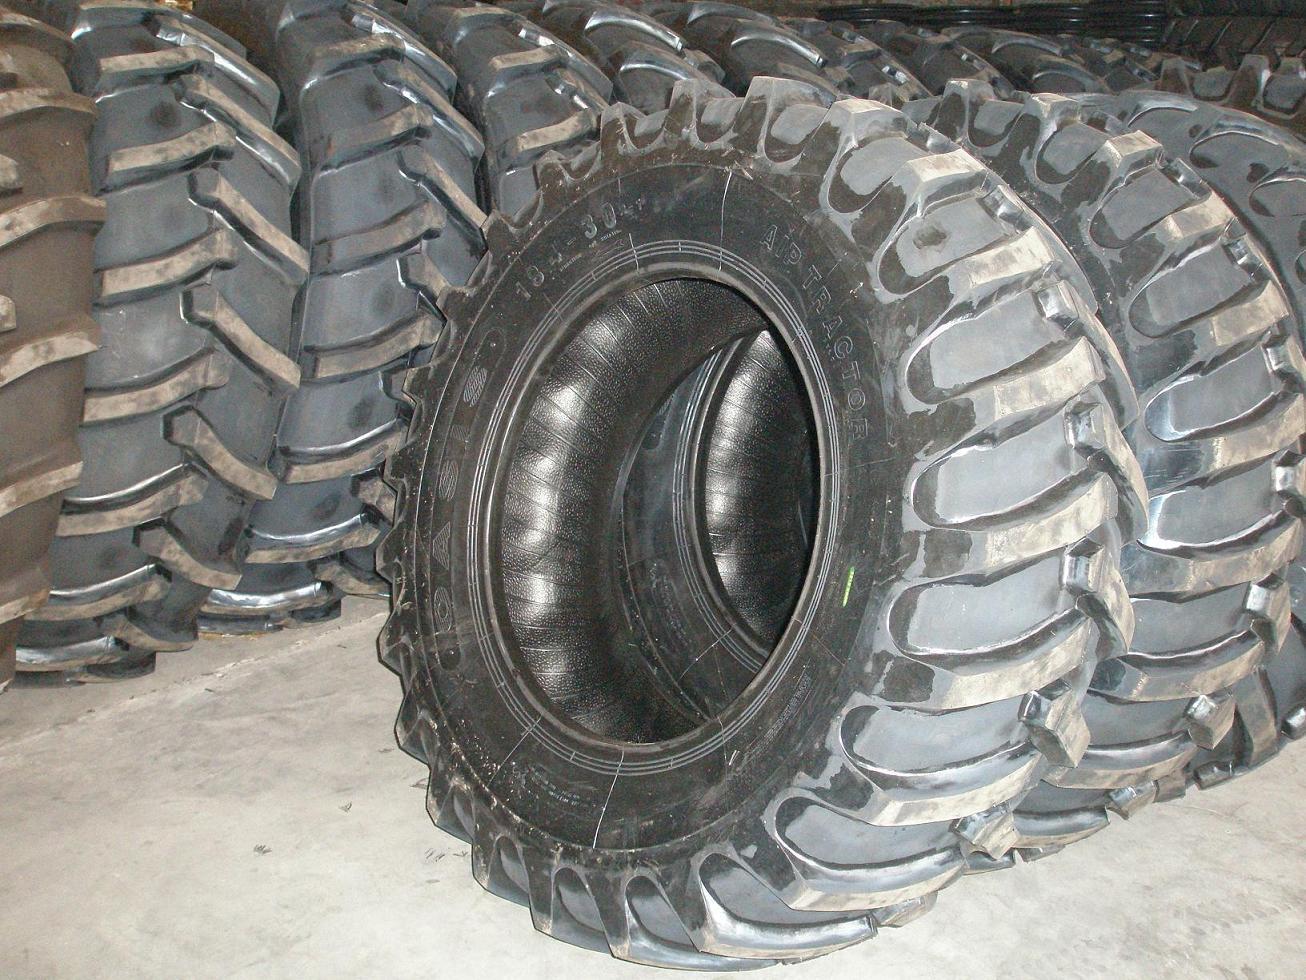 AGR Tires (11.2-24 14.9-28 16.9-30 18.4-38)